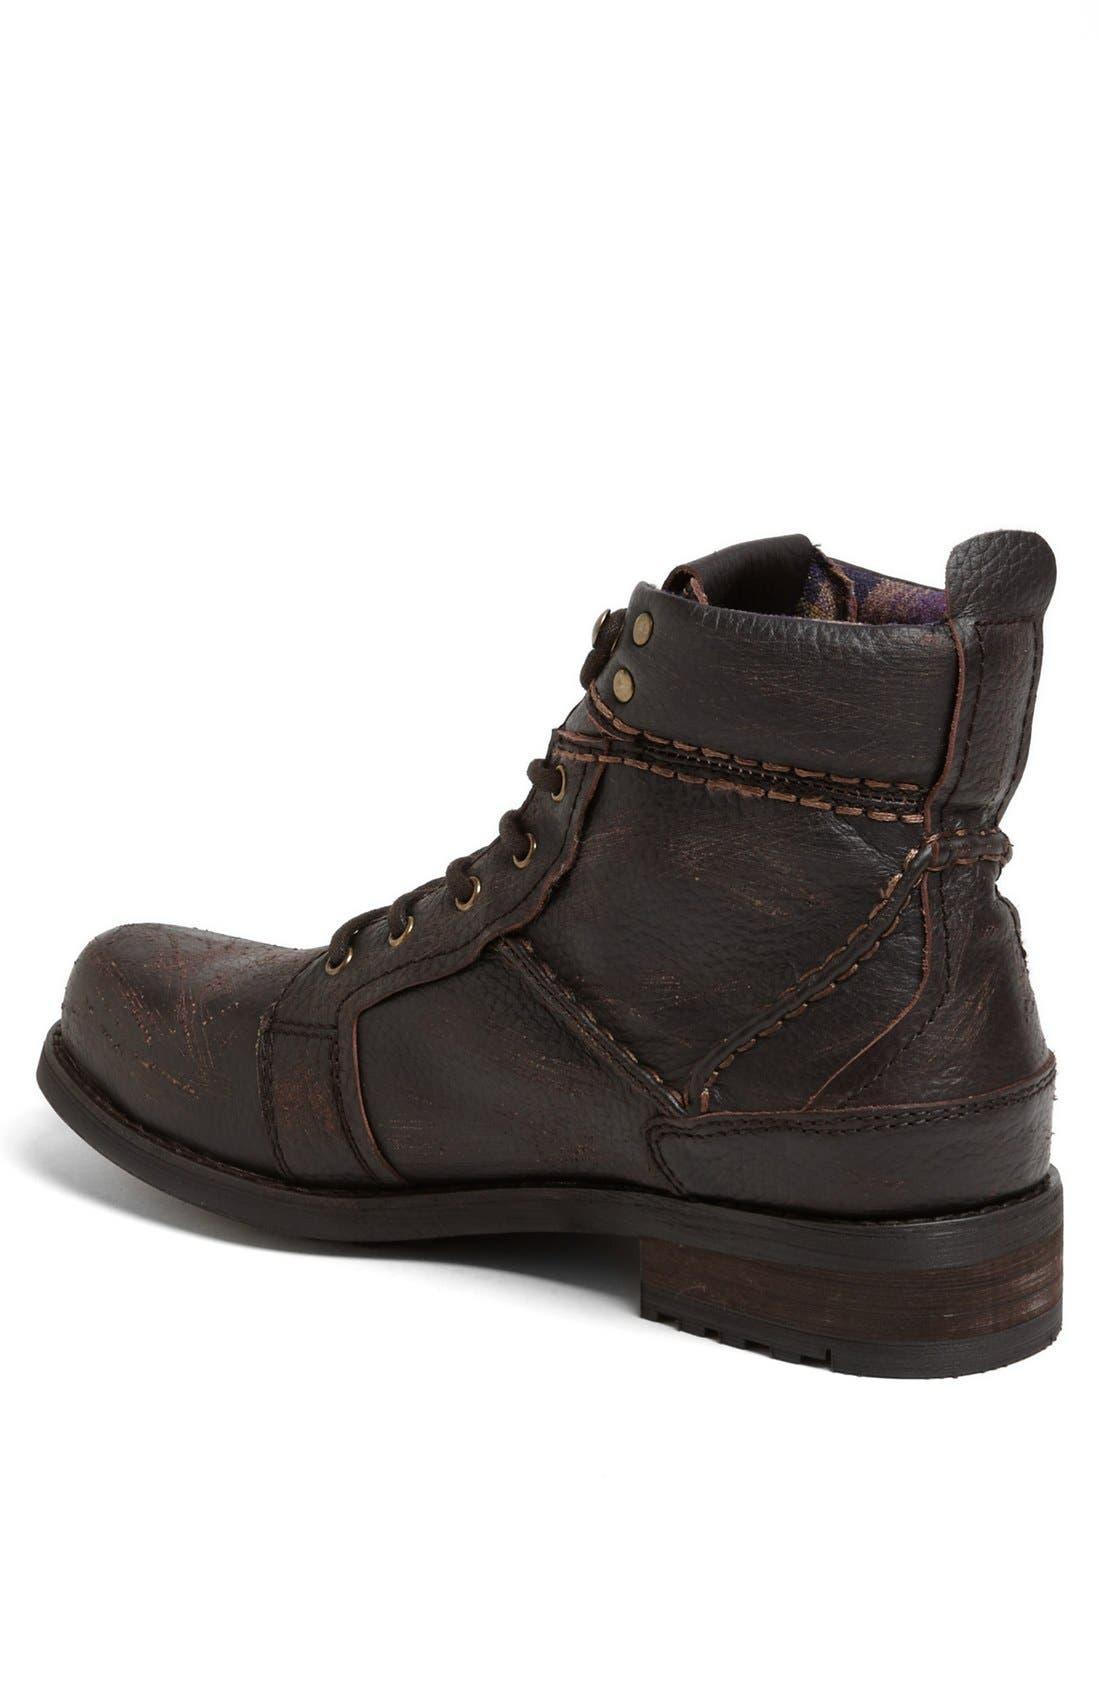 Alternate Image 2  - ZIGIny 'Catcher' Plain Toe Boot